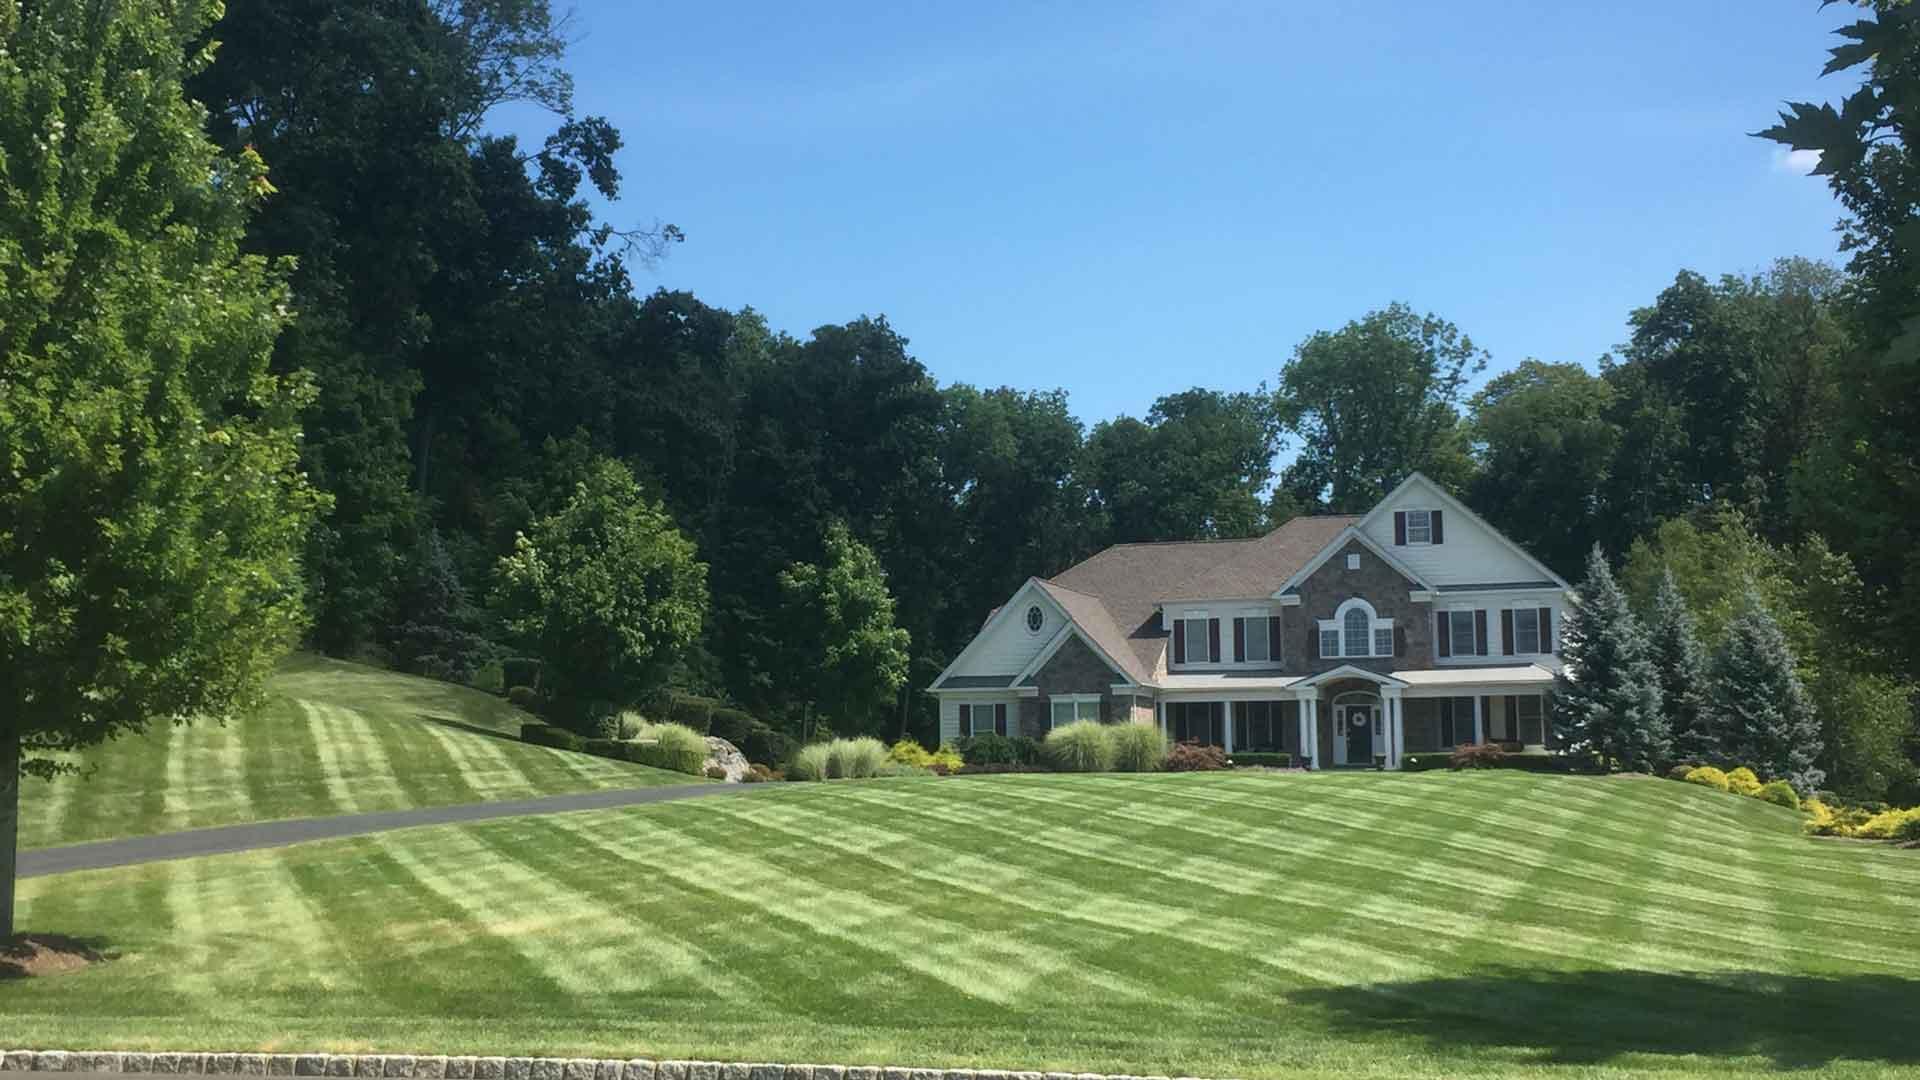 Auburn-Sky-Landscaping-Lawn-Mowing-Property-Maintenance.jpg